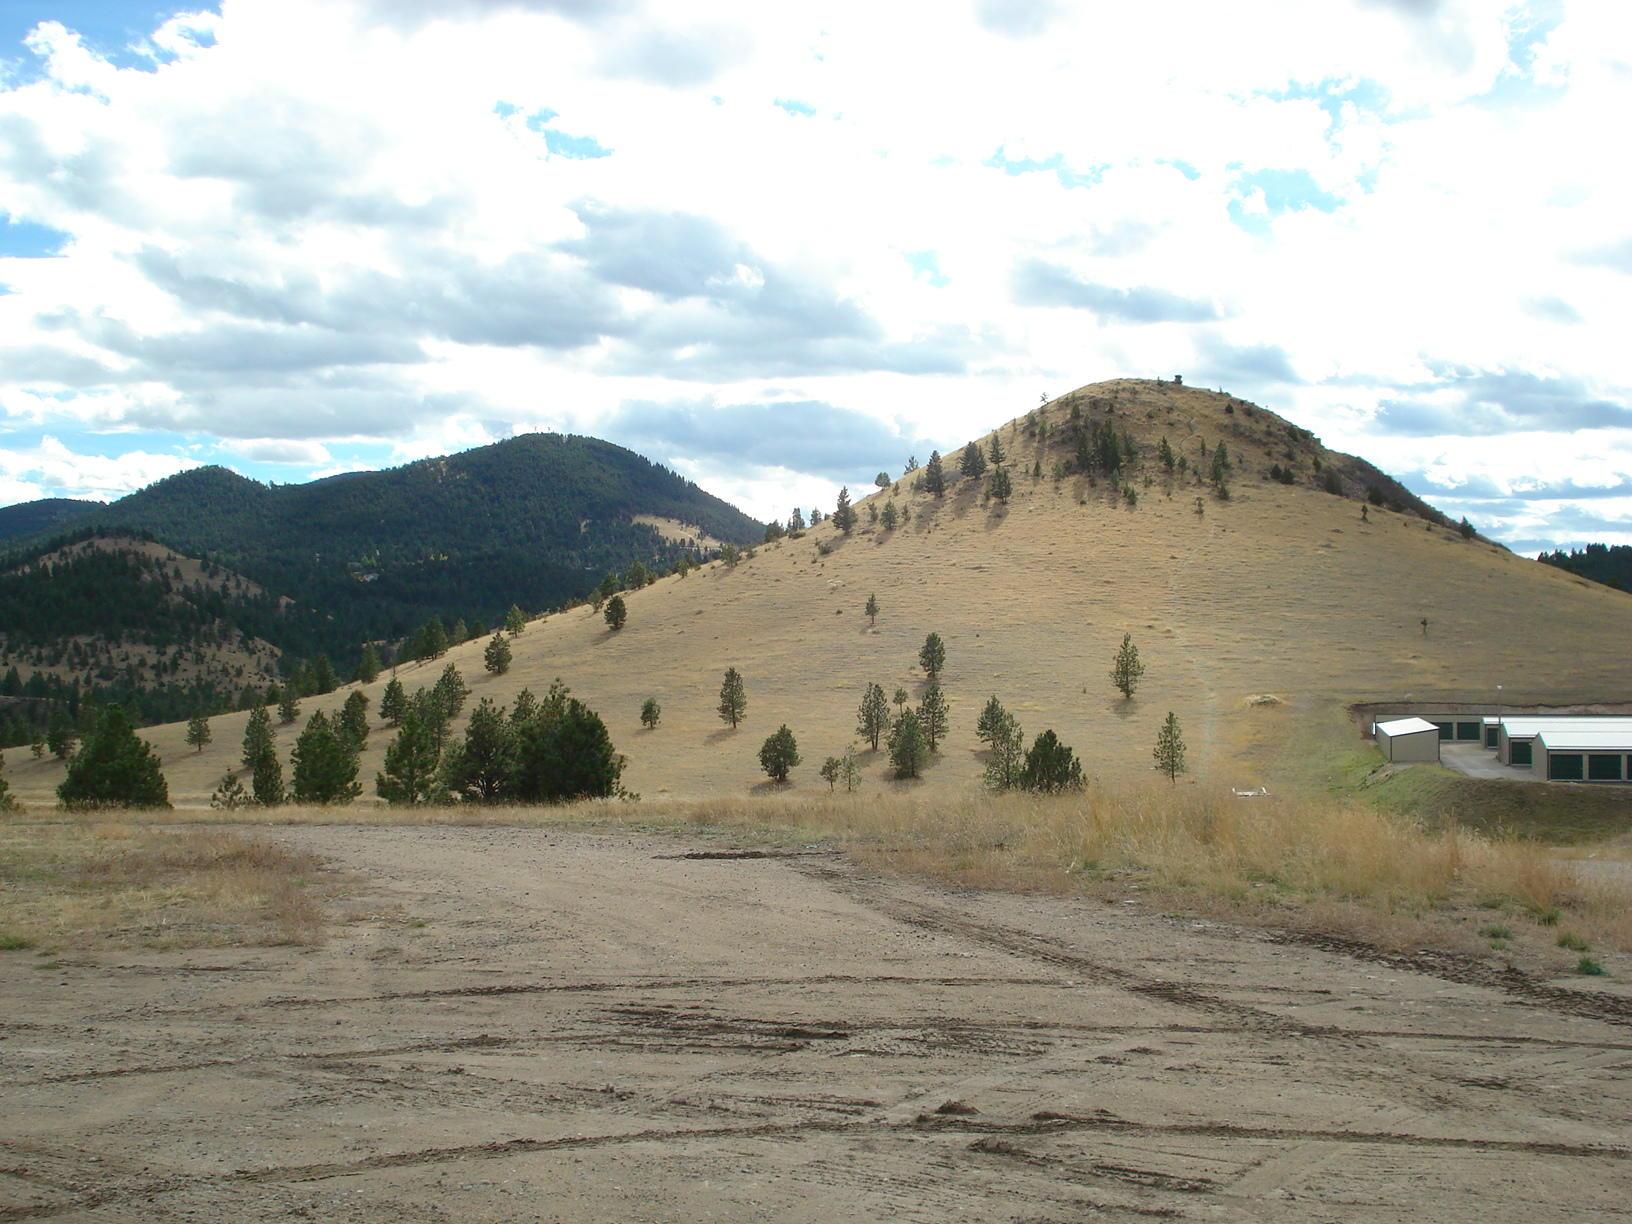 Tbd Virginia Road Rattle Snake Mtn., Montana City, MT 59634